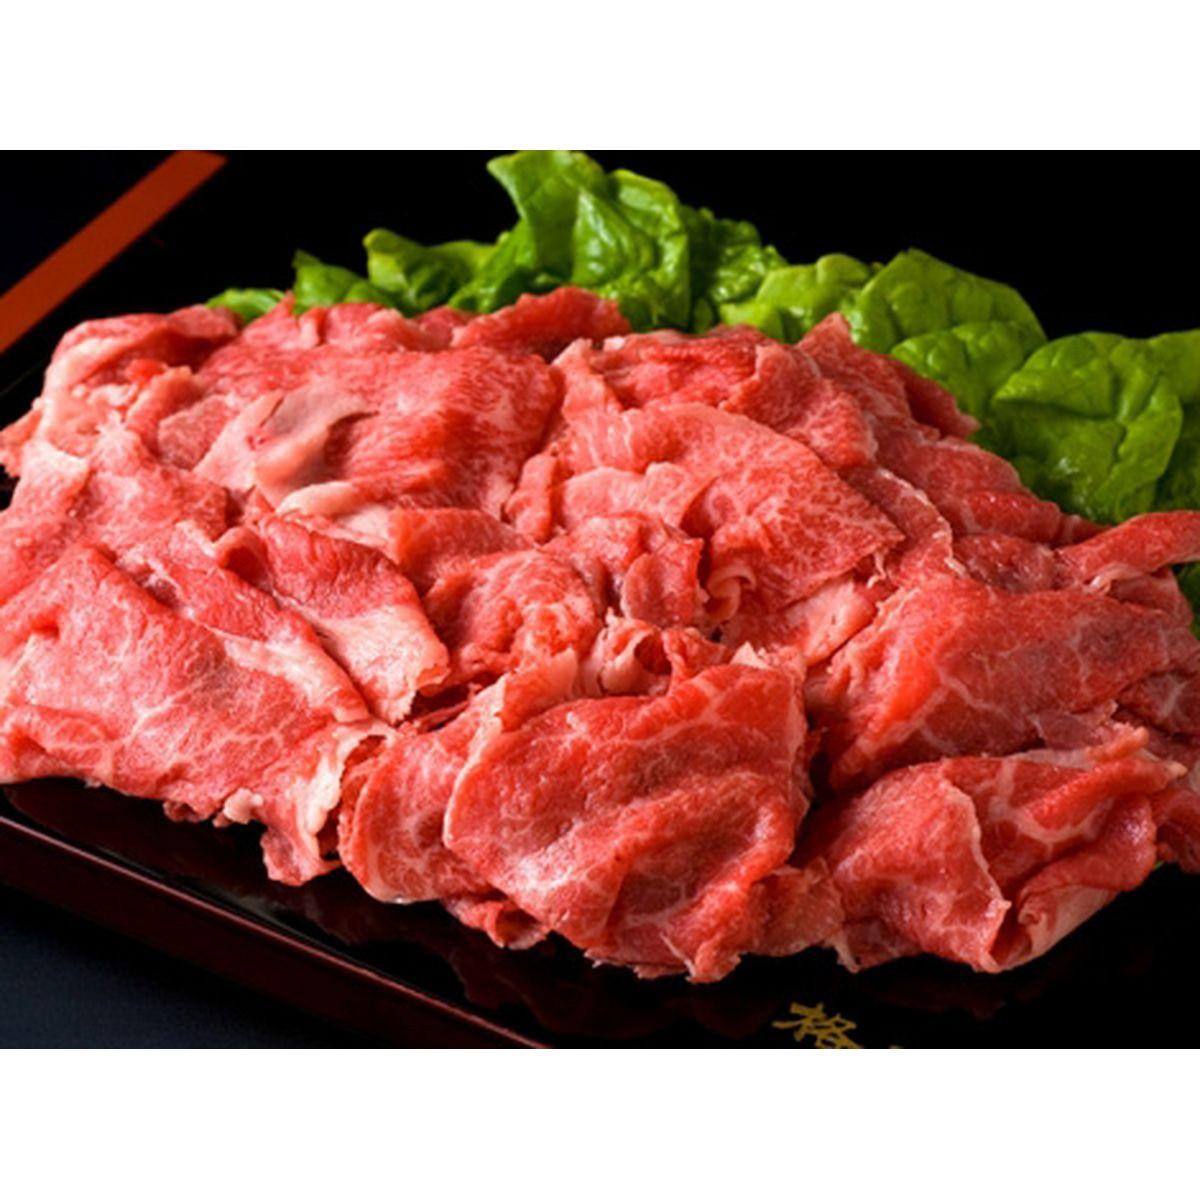 Kanzaki (格之進)厳選国産牛肉切り落とし 2kg(250g×8)